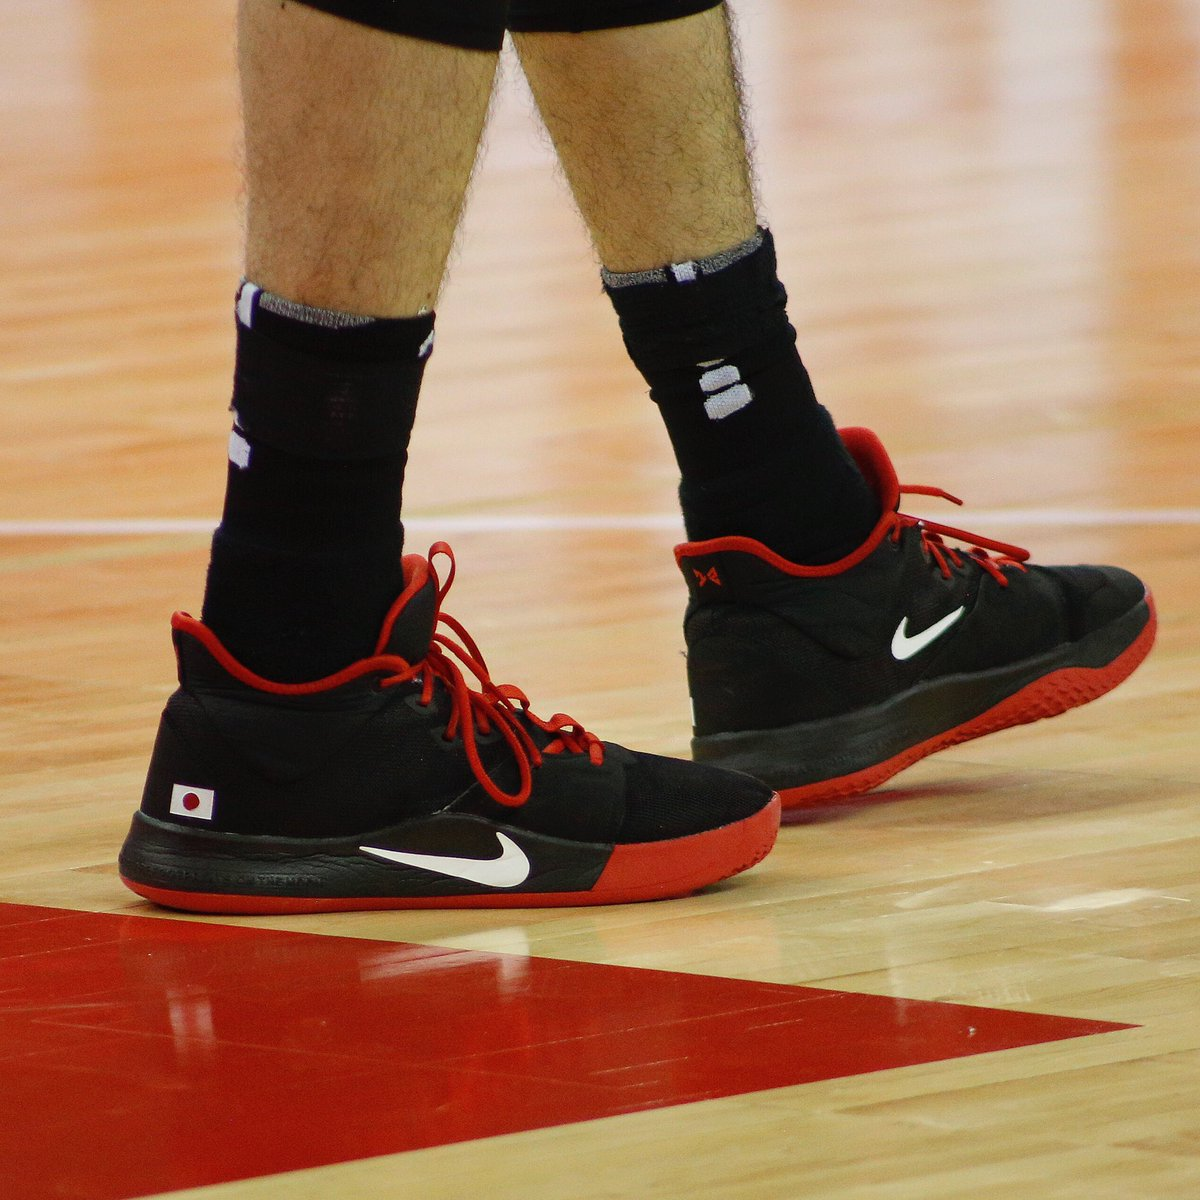 🇯🇵 @wacchi1013 in the Nike PG 3 at the @fibawc! #NBAKicks